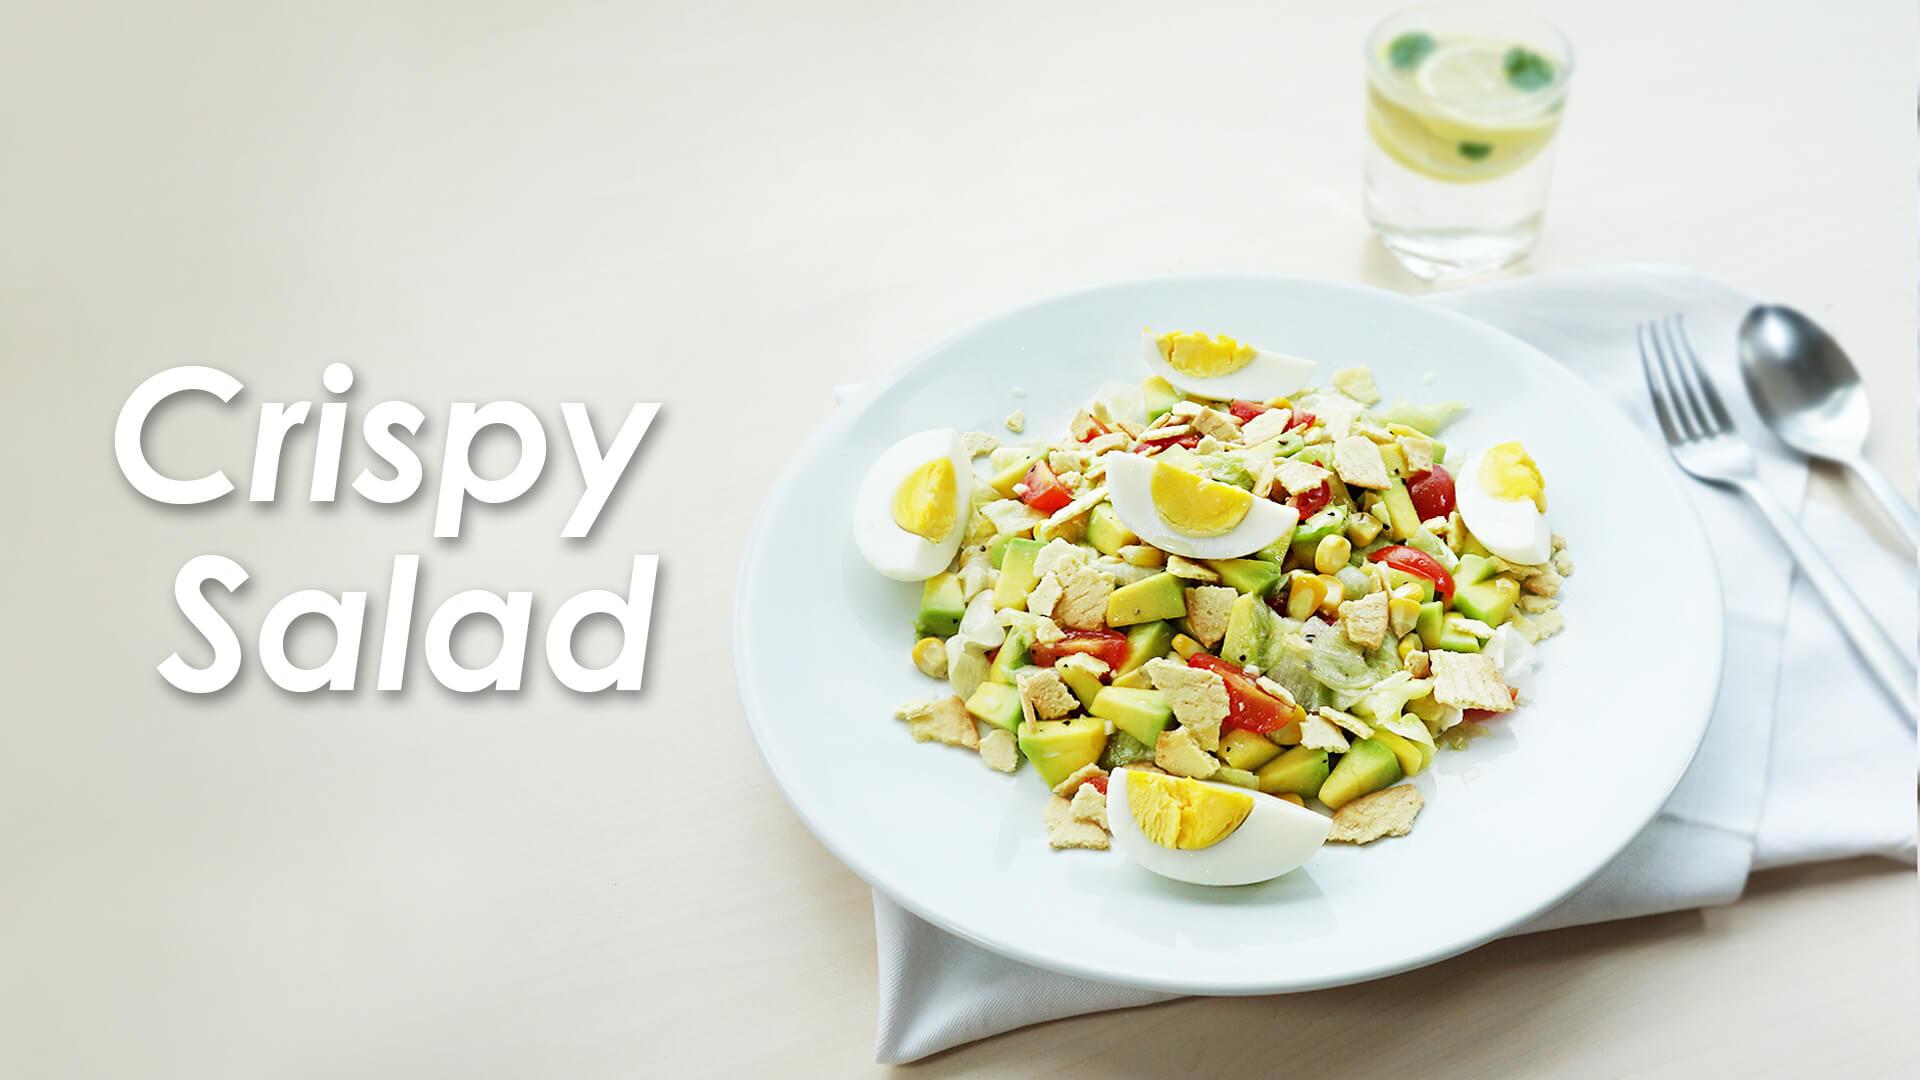 Crispy Salad_